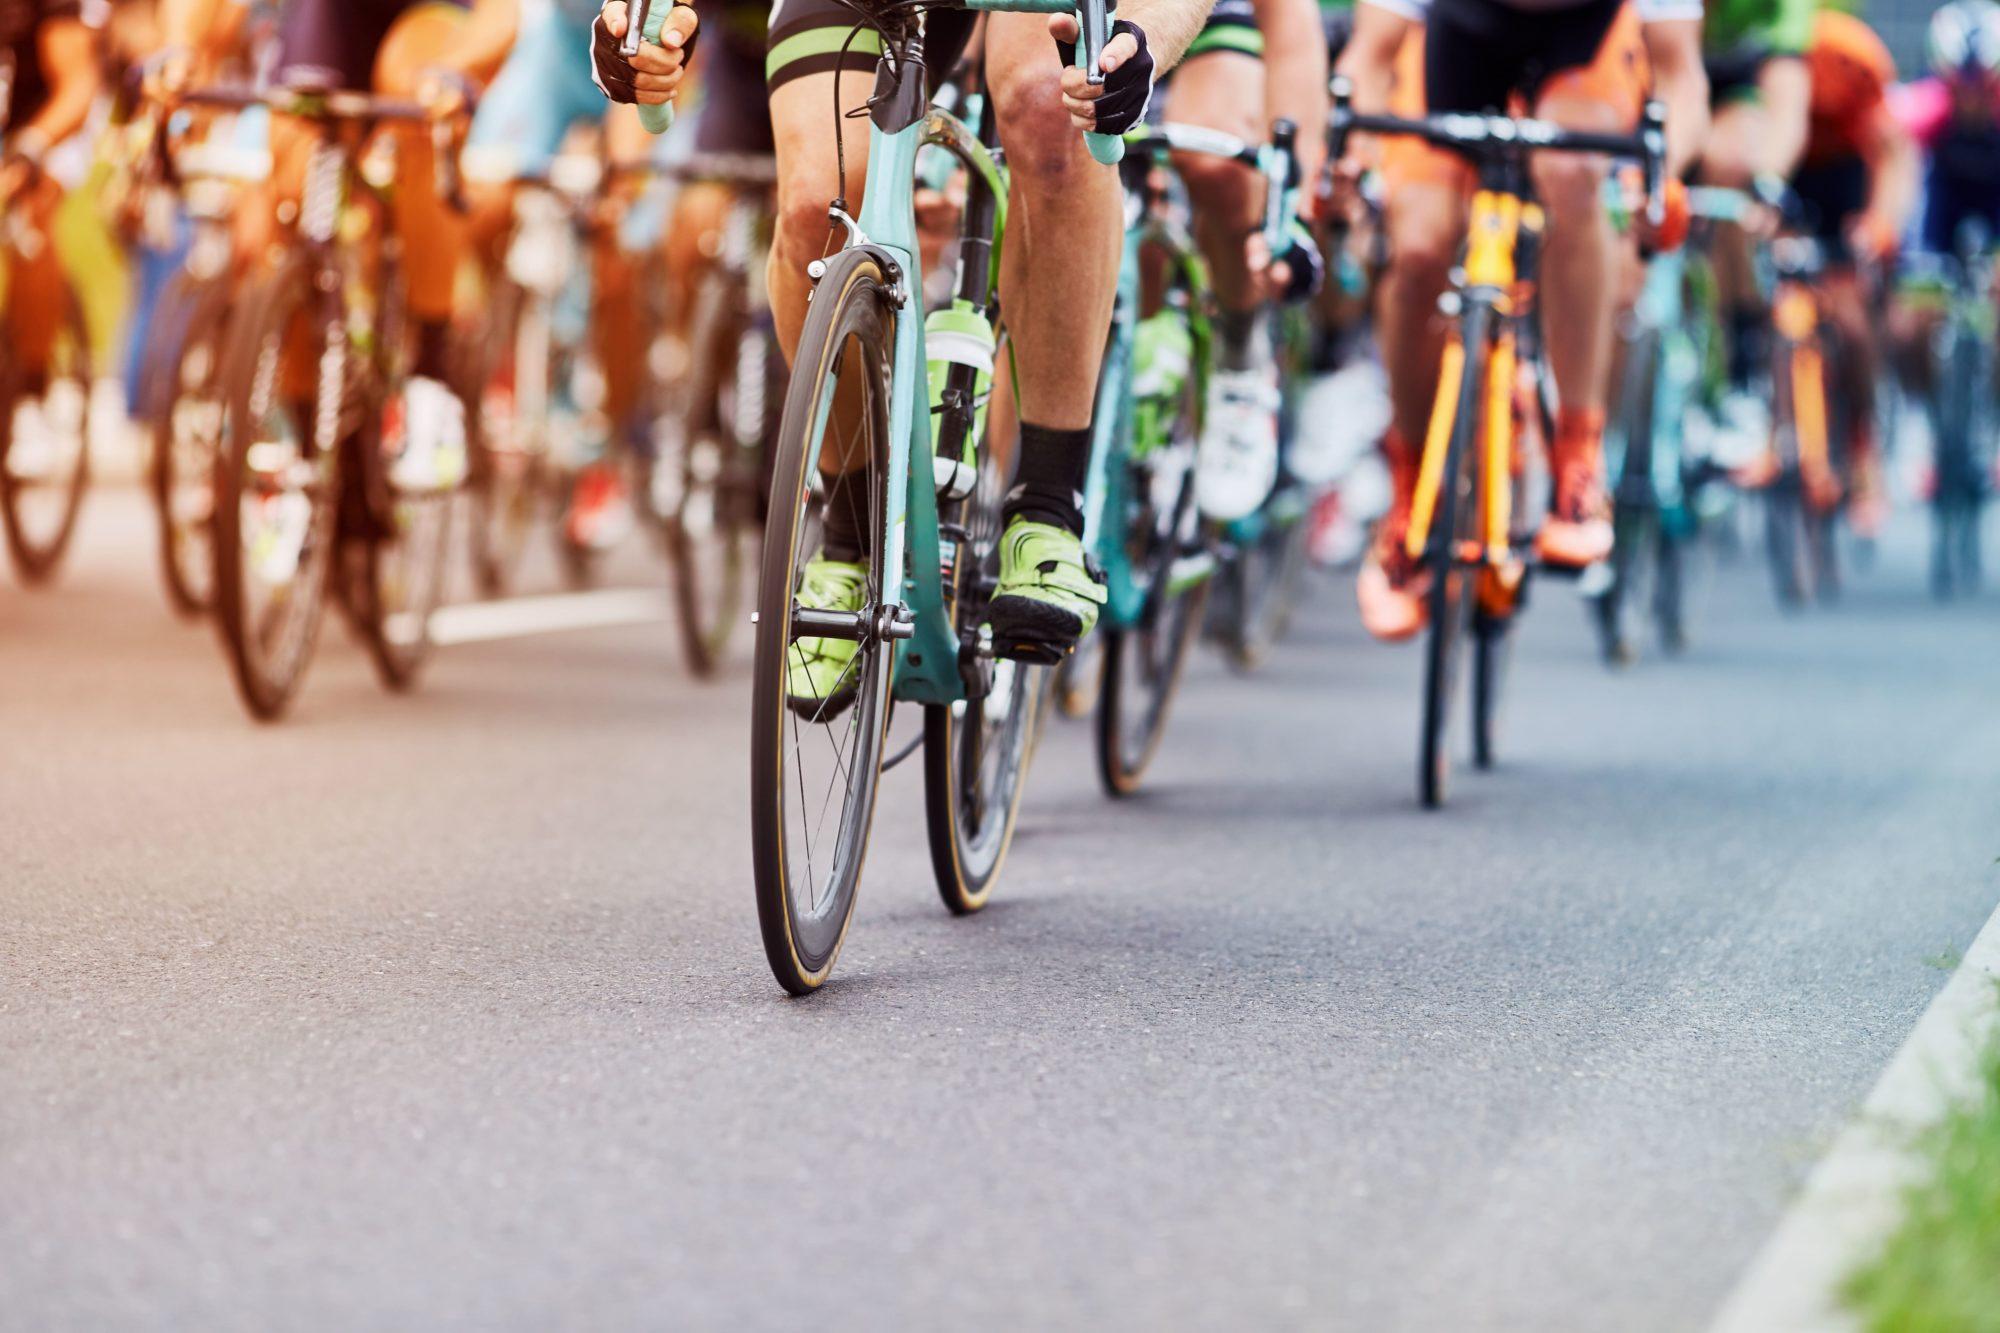 sportgeneeskunde_sportkeuring_wielrennen_smcp